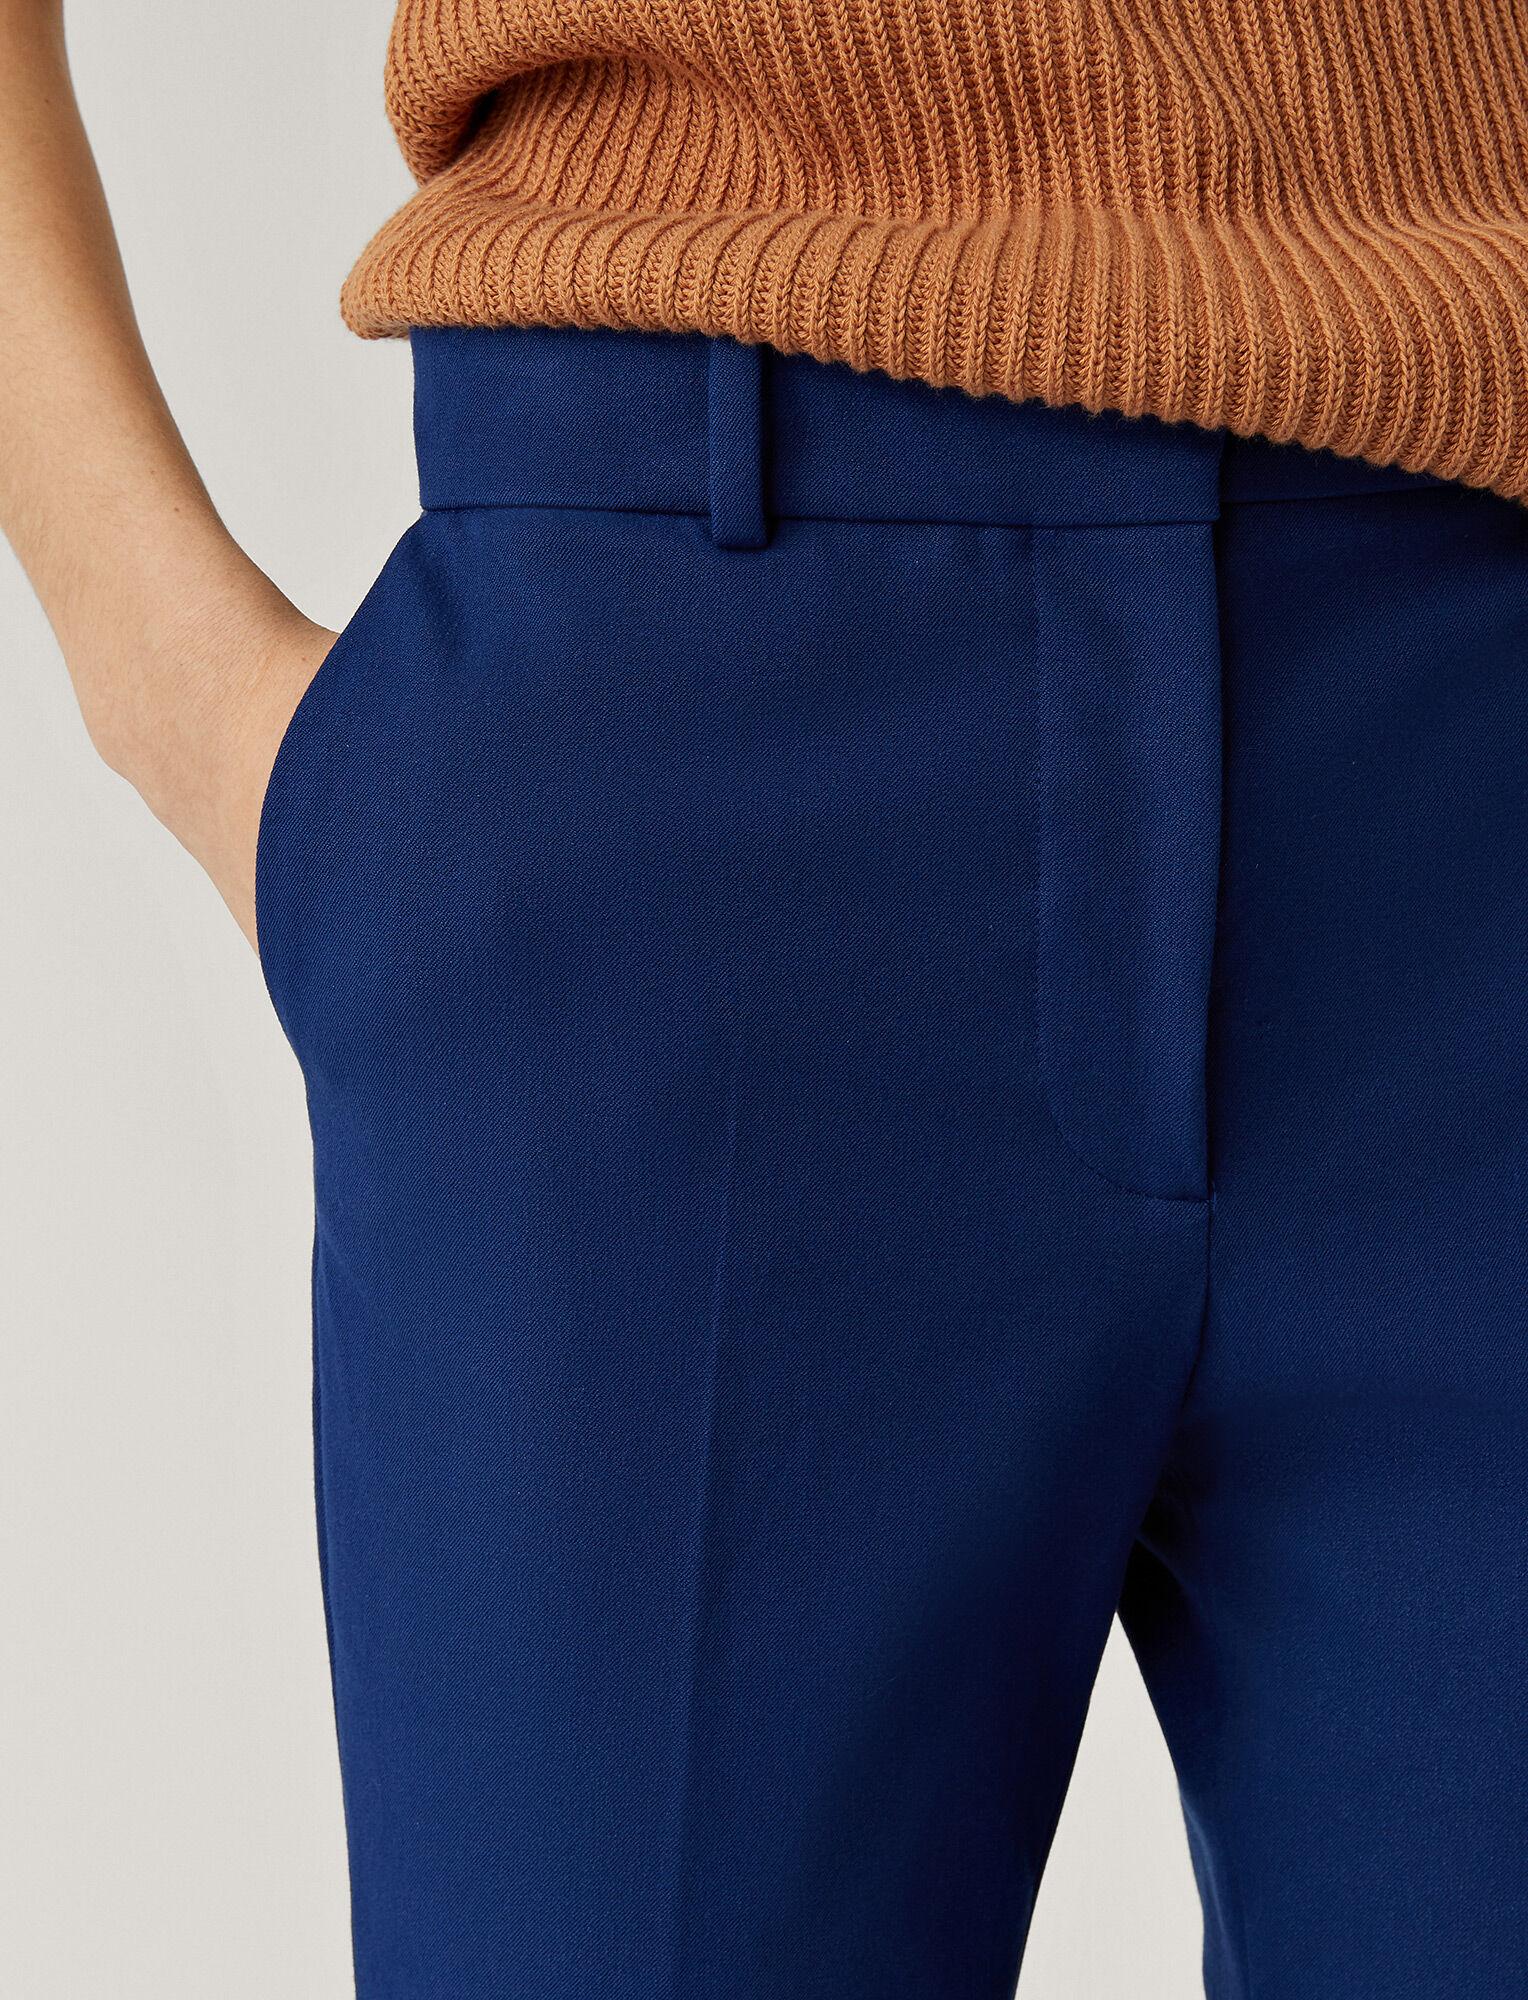 Joseph, Cole Gabardine Stretch Trousers, in KLEIN